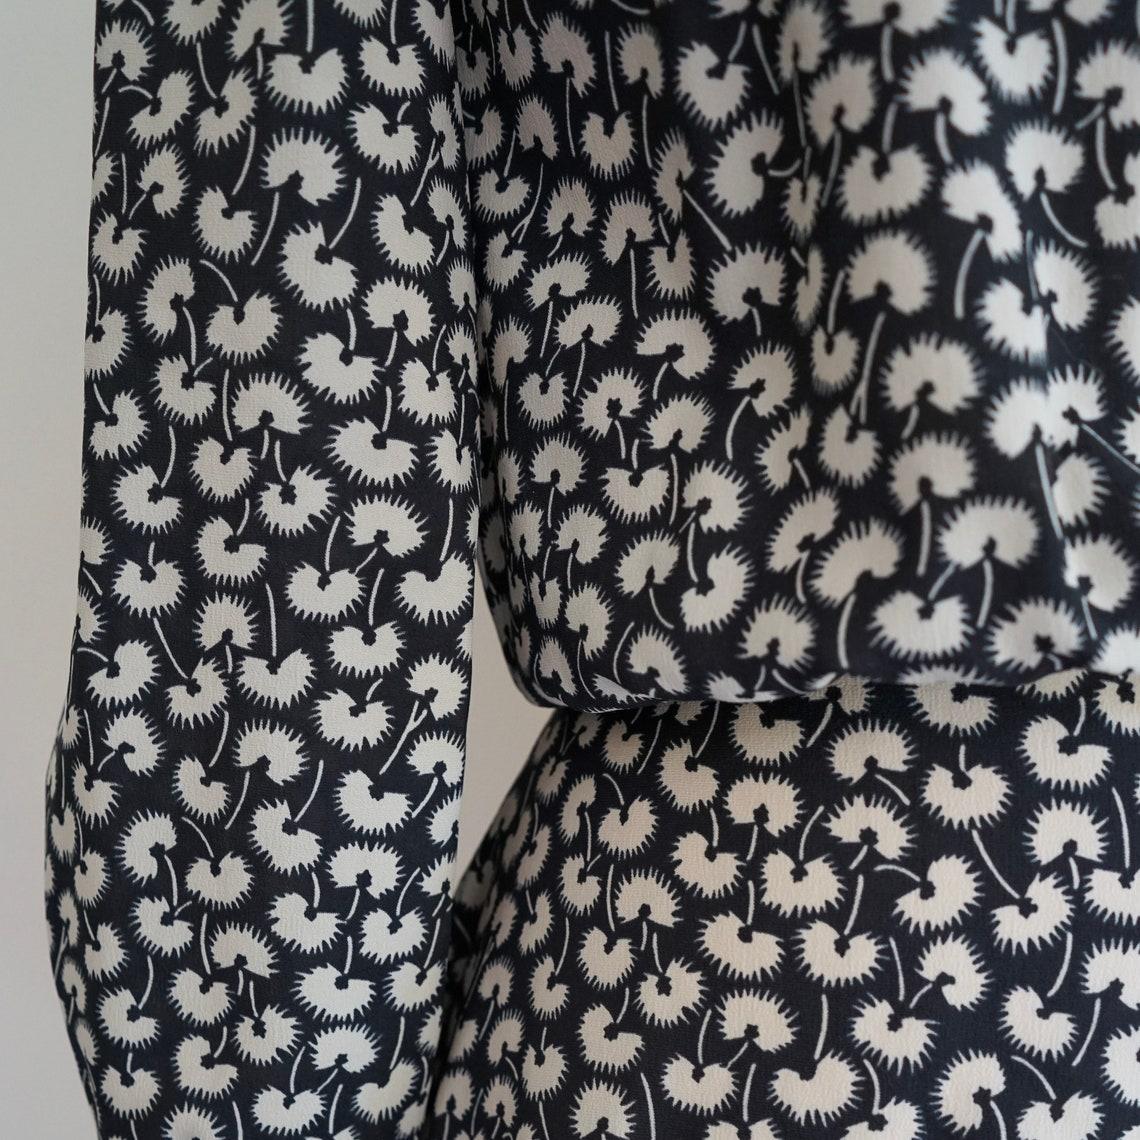 Vintage 1970s floral print dress  70s black and white